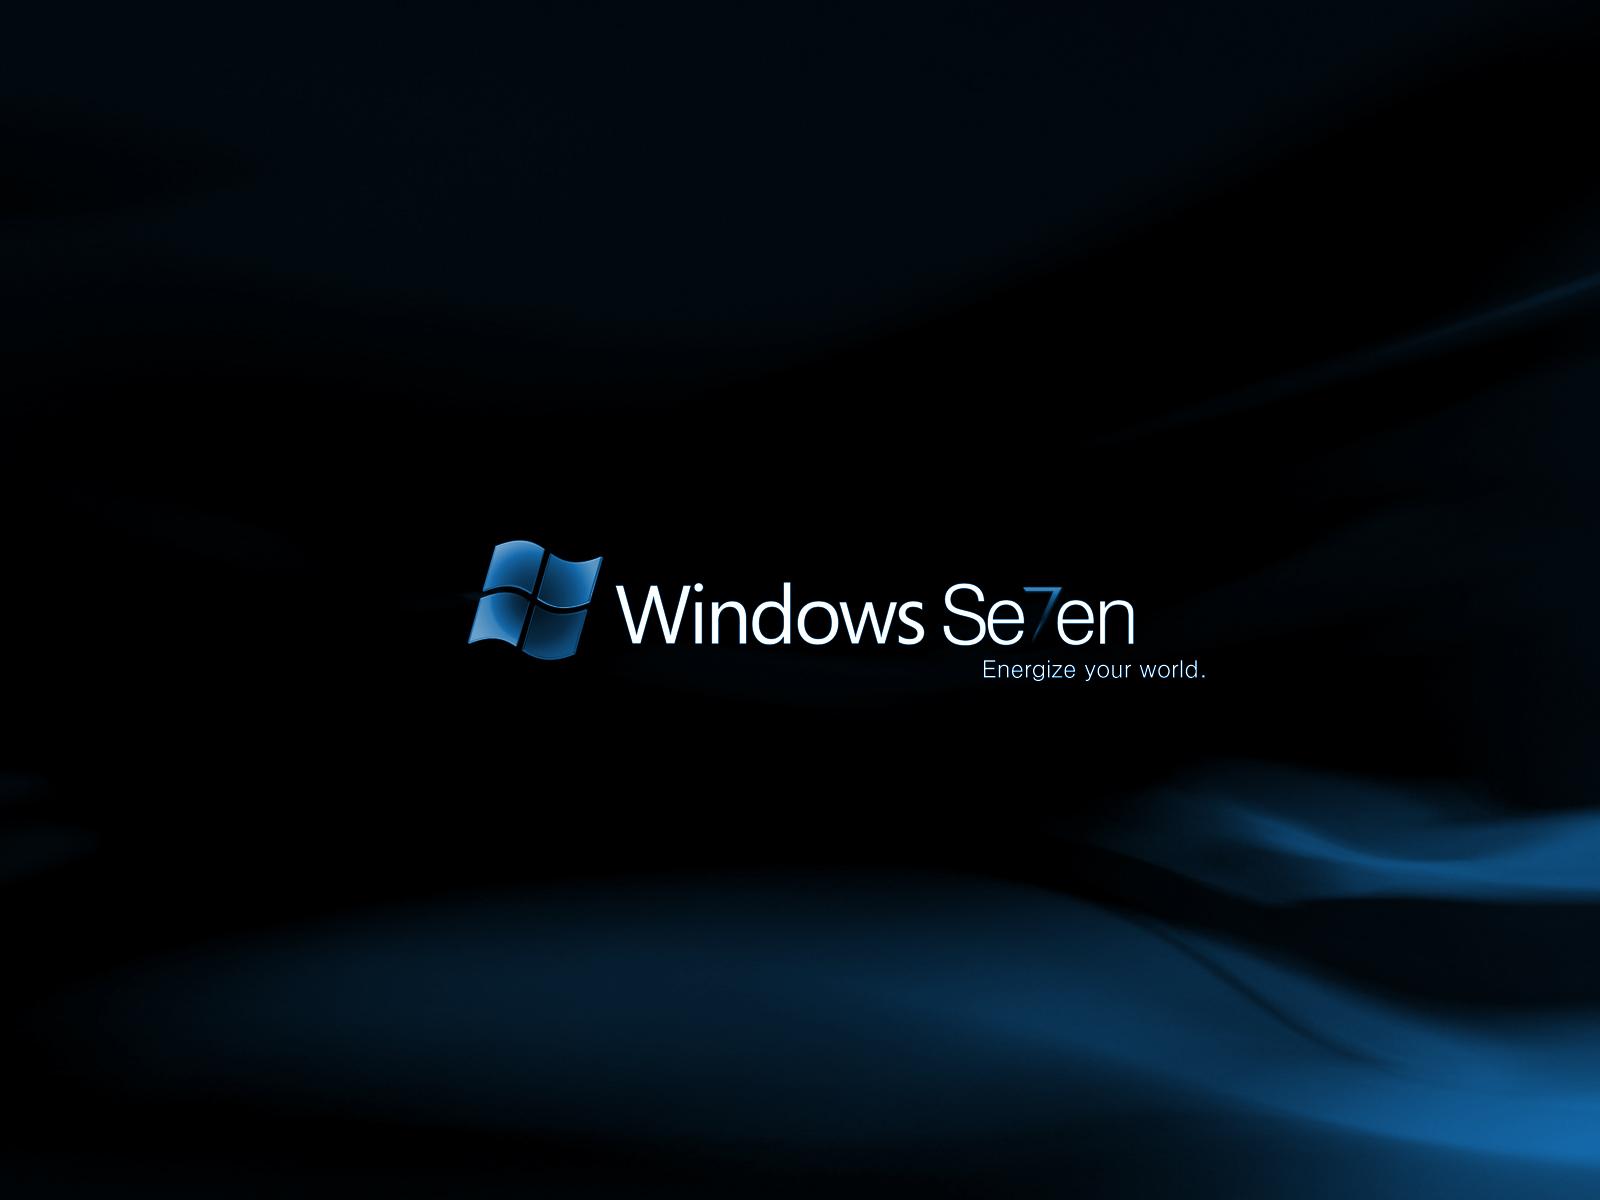 Hd Wallpapers Hd Hd Wallpapers Windows 7 Ultimate